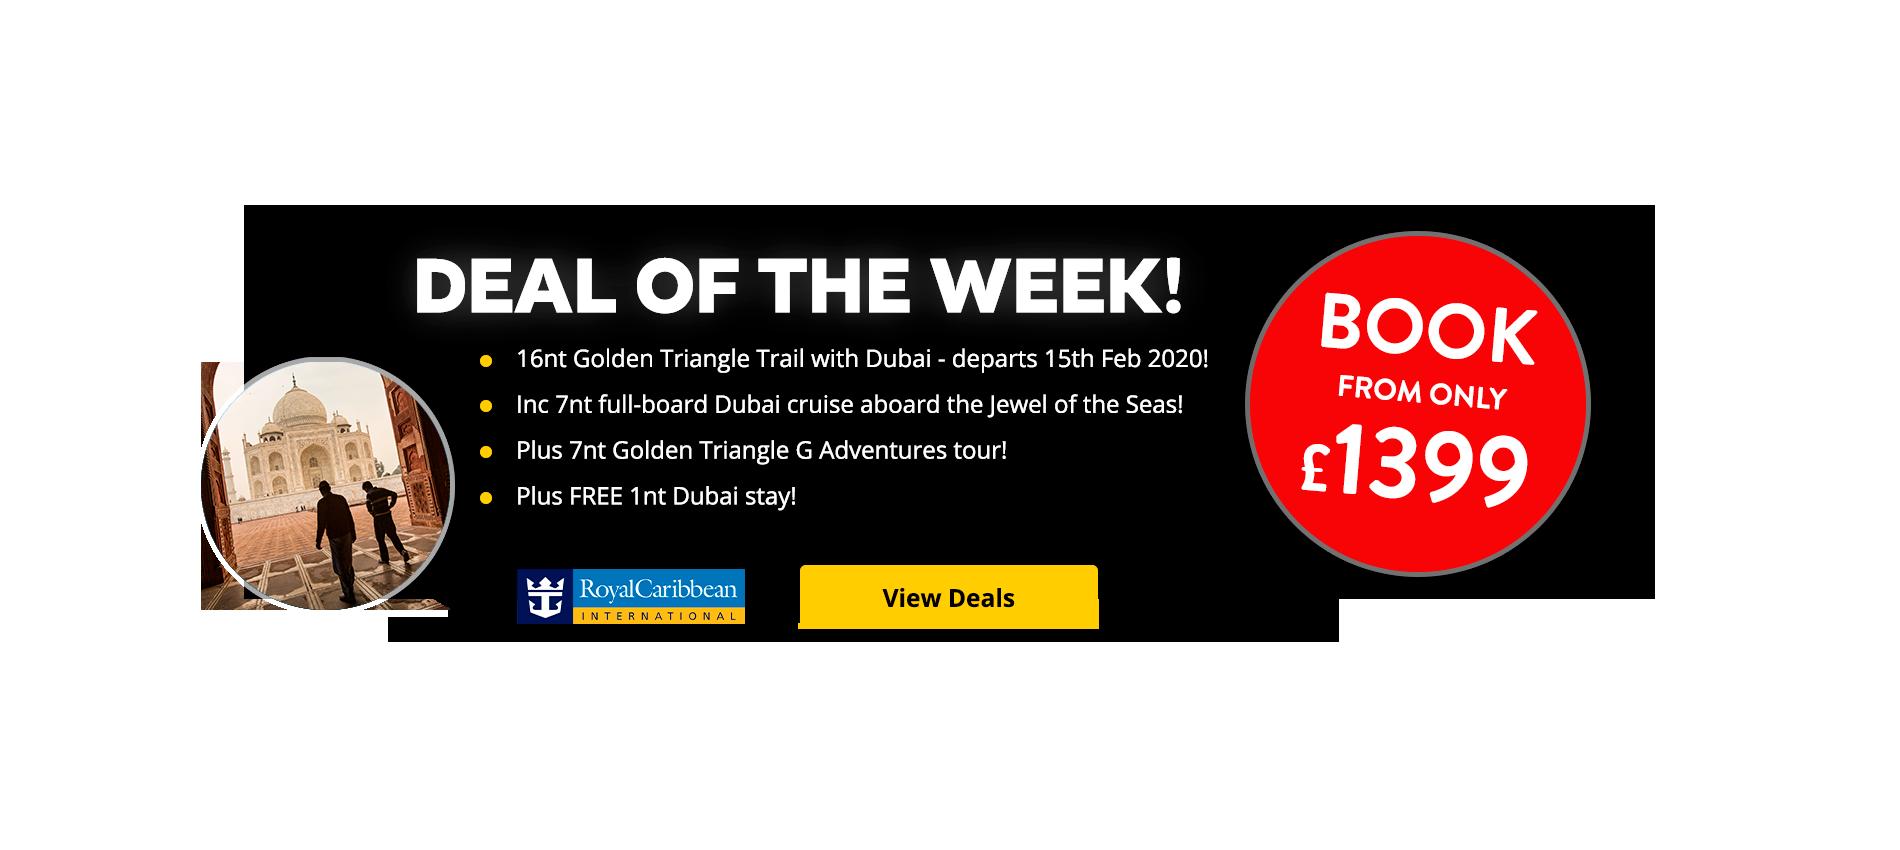 16nt Golden Triangle Trail with Dubai - departs 15th Feb 2020 Inc 7nt full-board Dubai cruise aboard the Jewel of the Seas! Plus 7nt Golden Triangle G Adventures tour! Plus FREE 1nt Dubai stay!